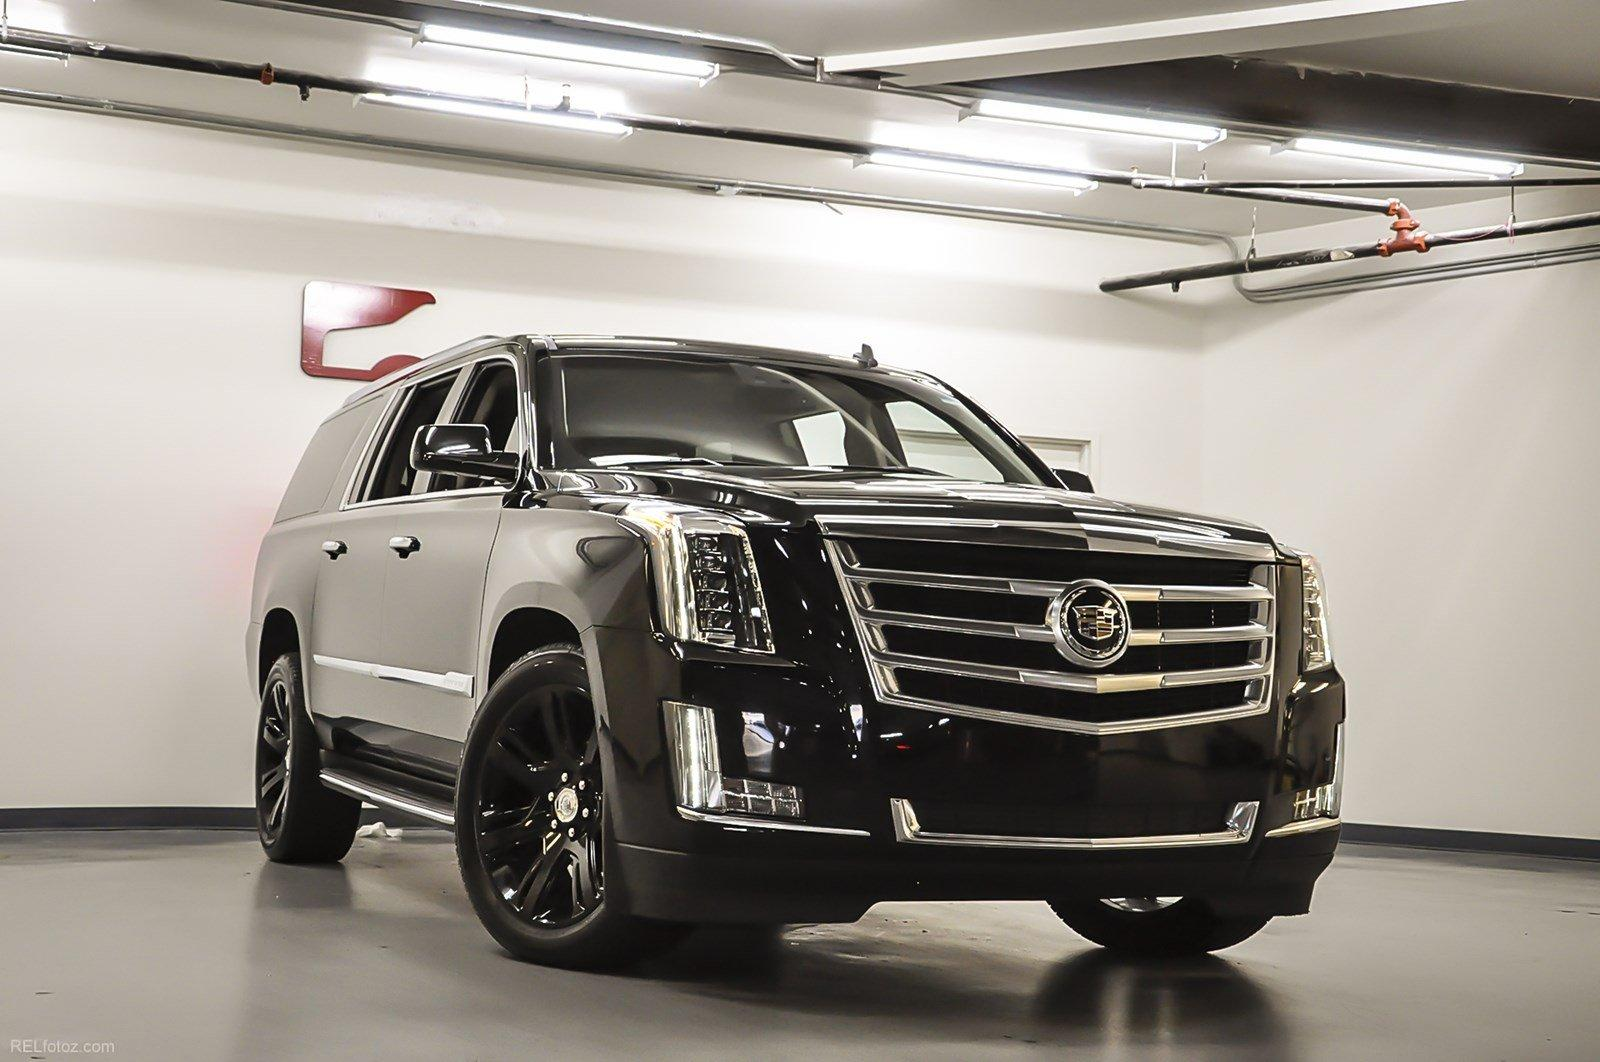 2015 Cadillac Escalade Esv Luxury Stock 274386 For Sale Near Gmc Ga Used Marietta